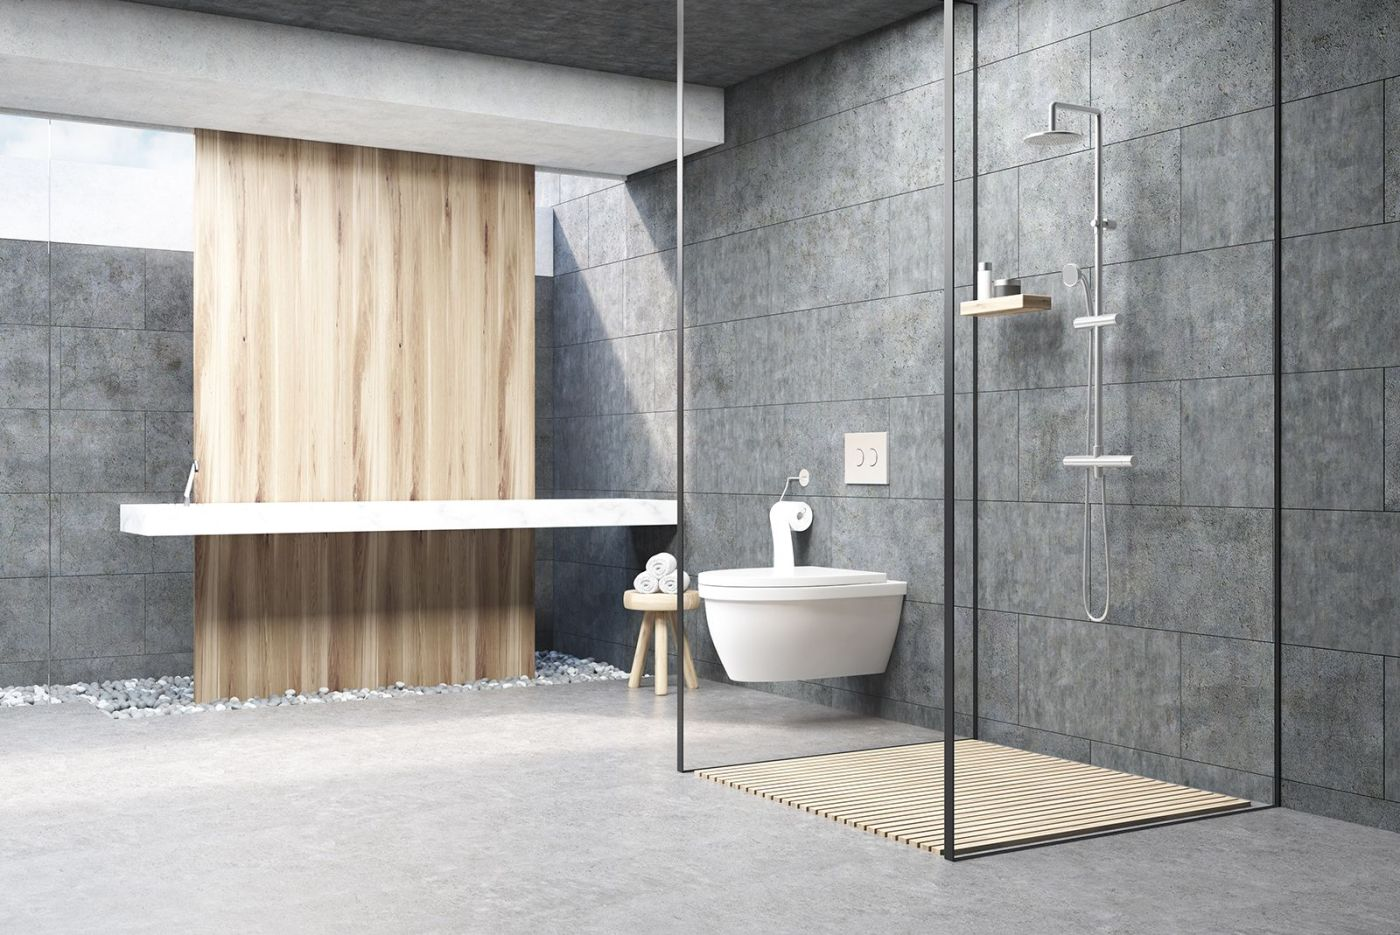 Outstanding Features & Benefits Of Bathroom Shower Screens In Sydney